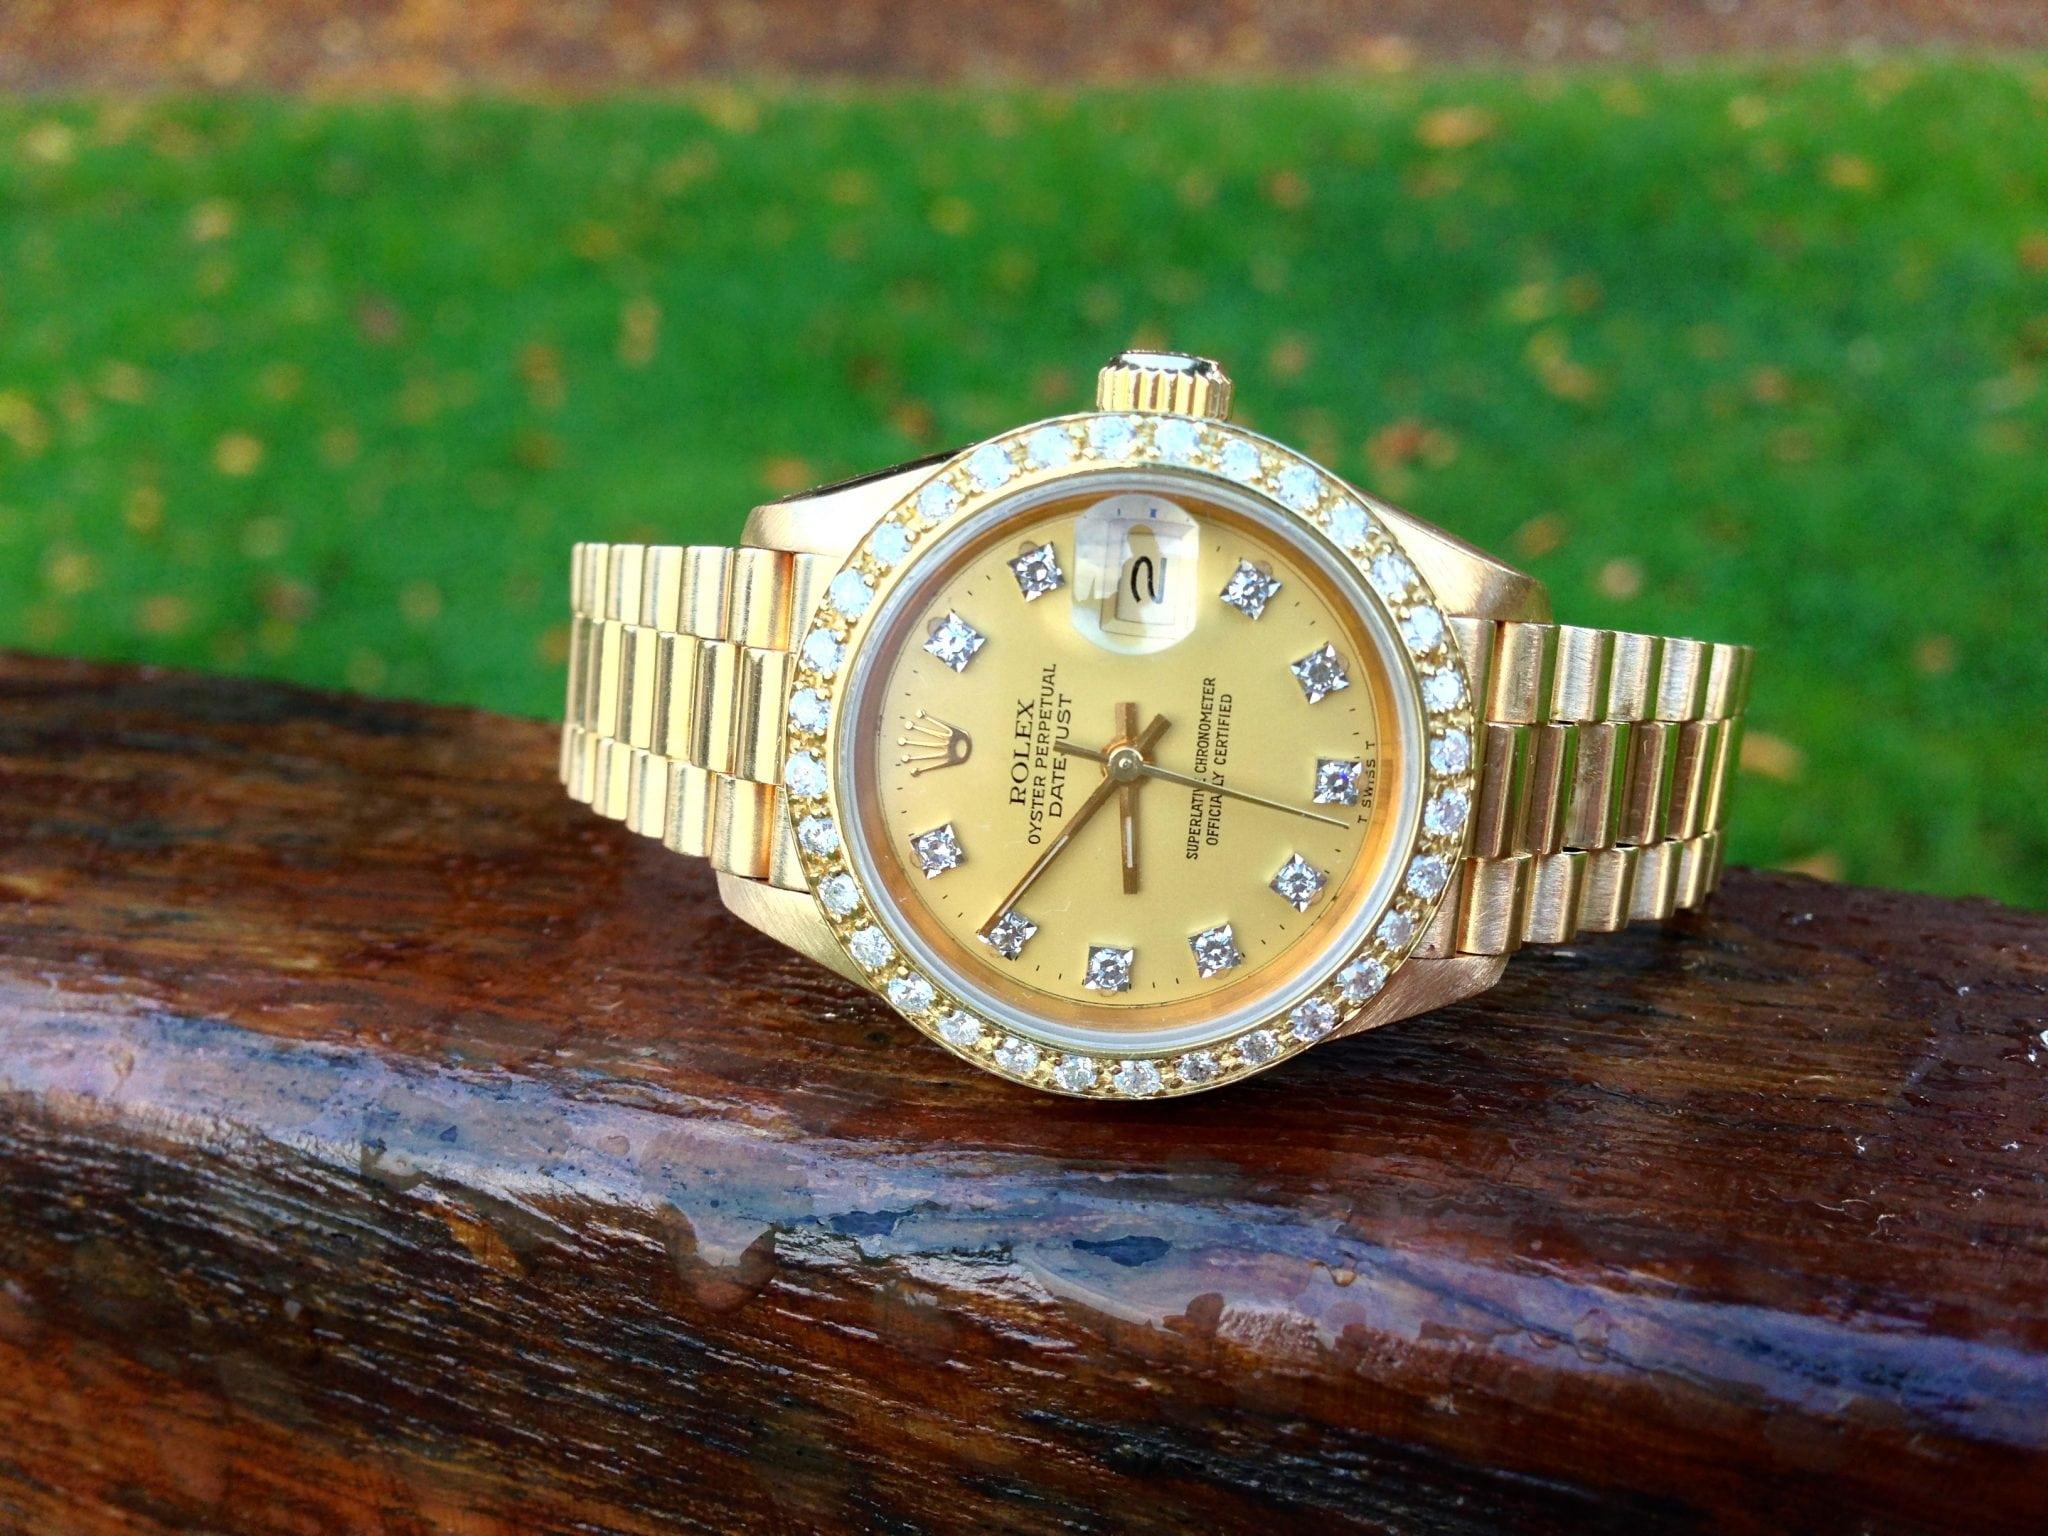 Rolex Lady Datejust president Diamond bezel - 69178